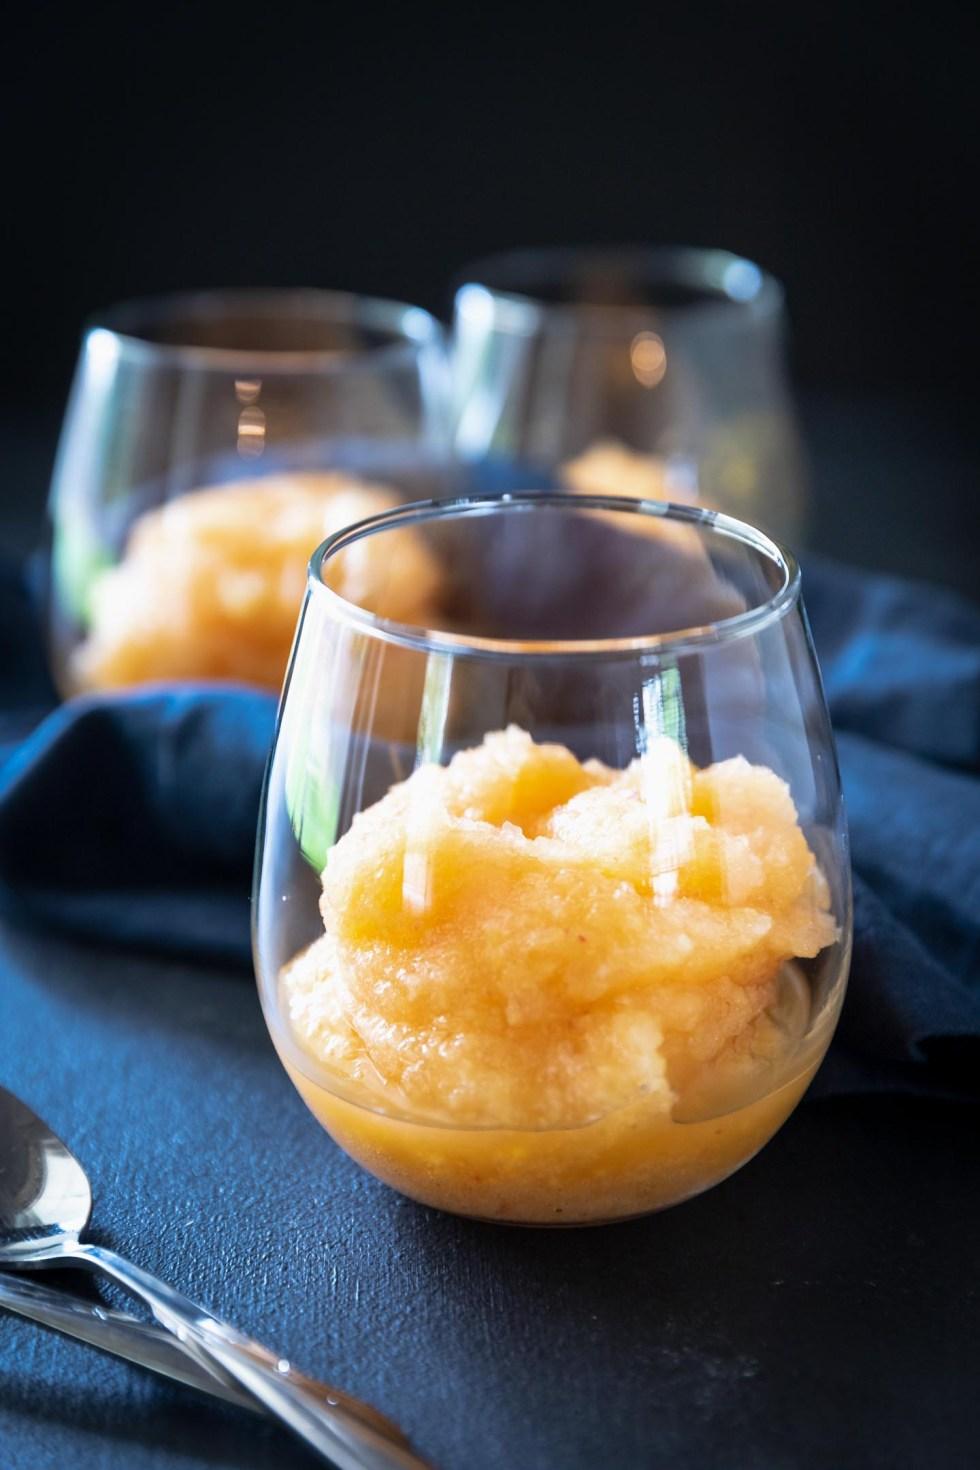 Wine glass containing frozen peach slushie